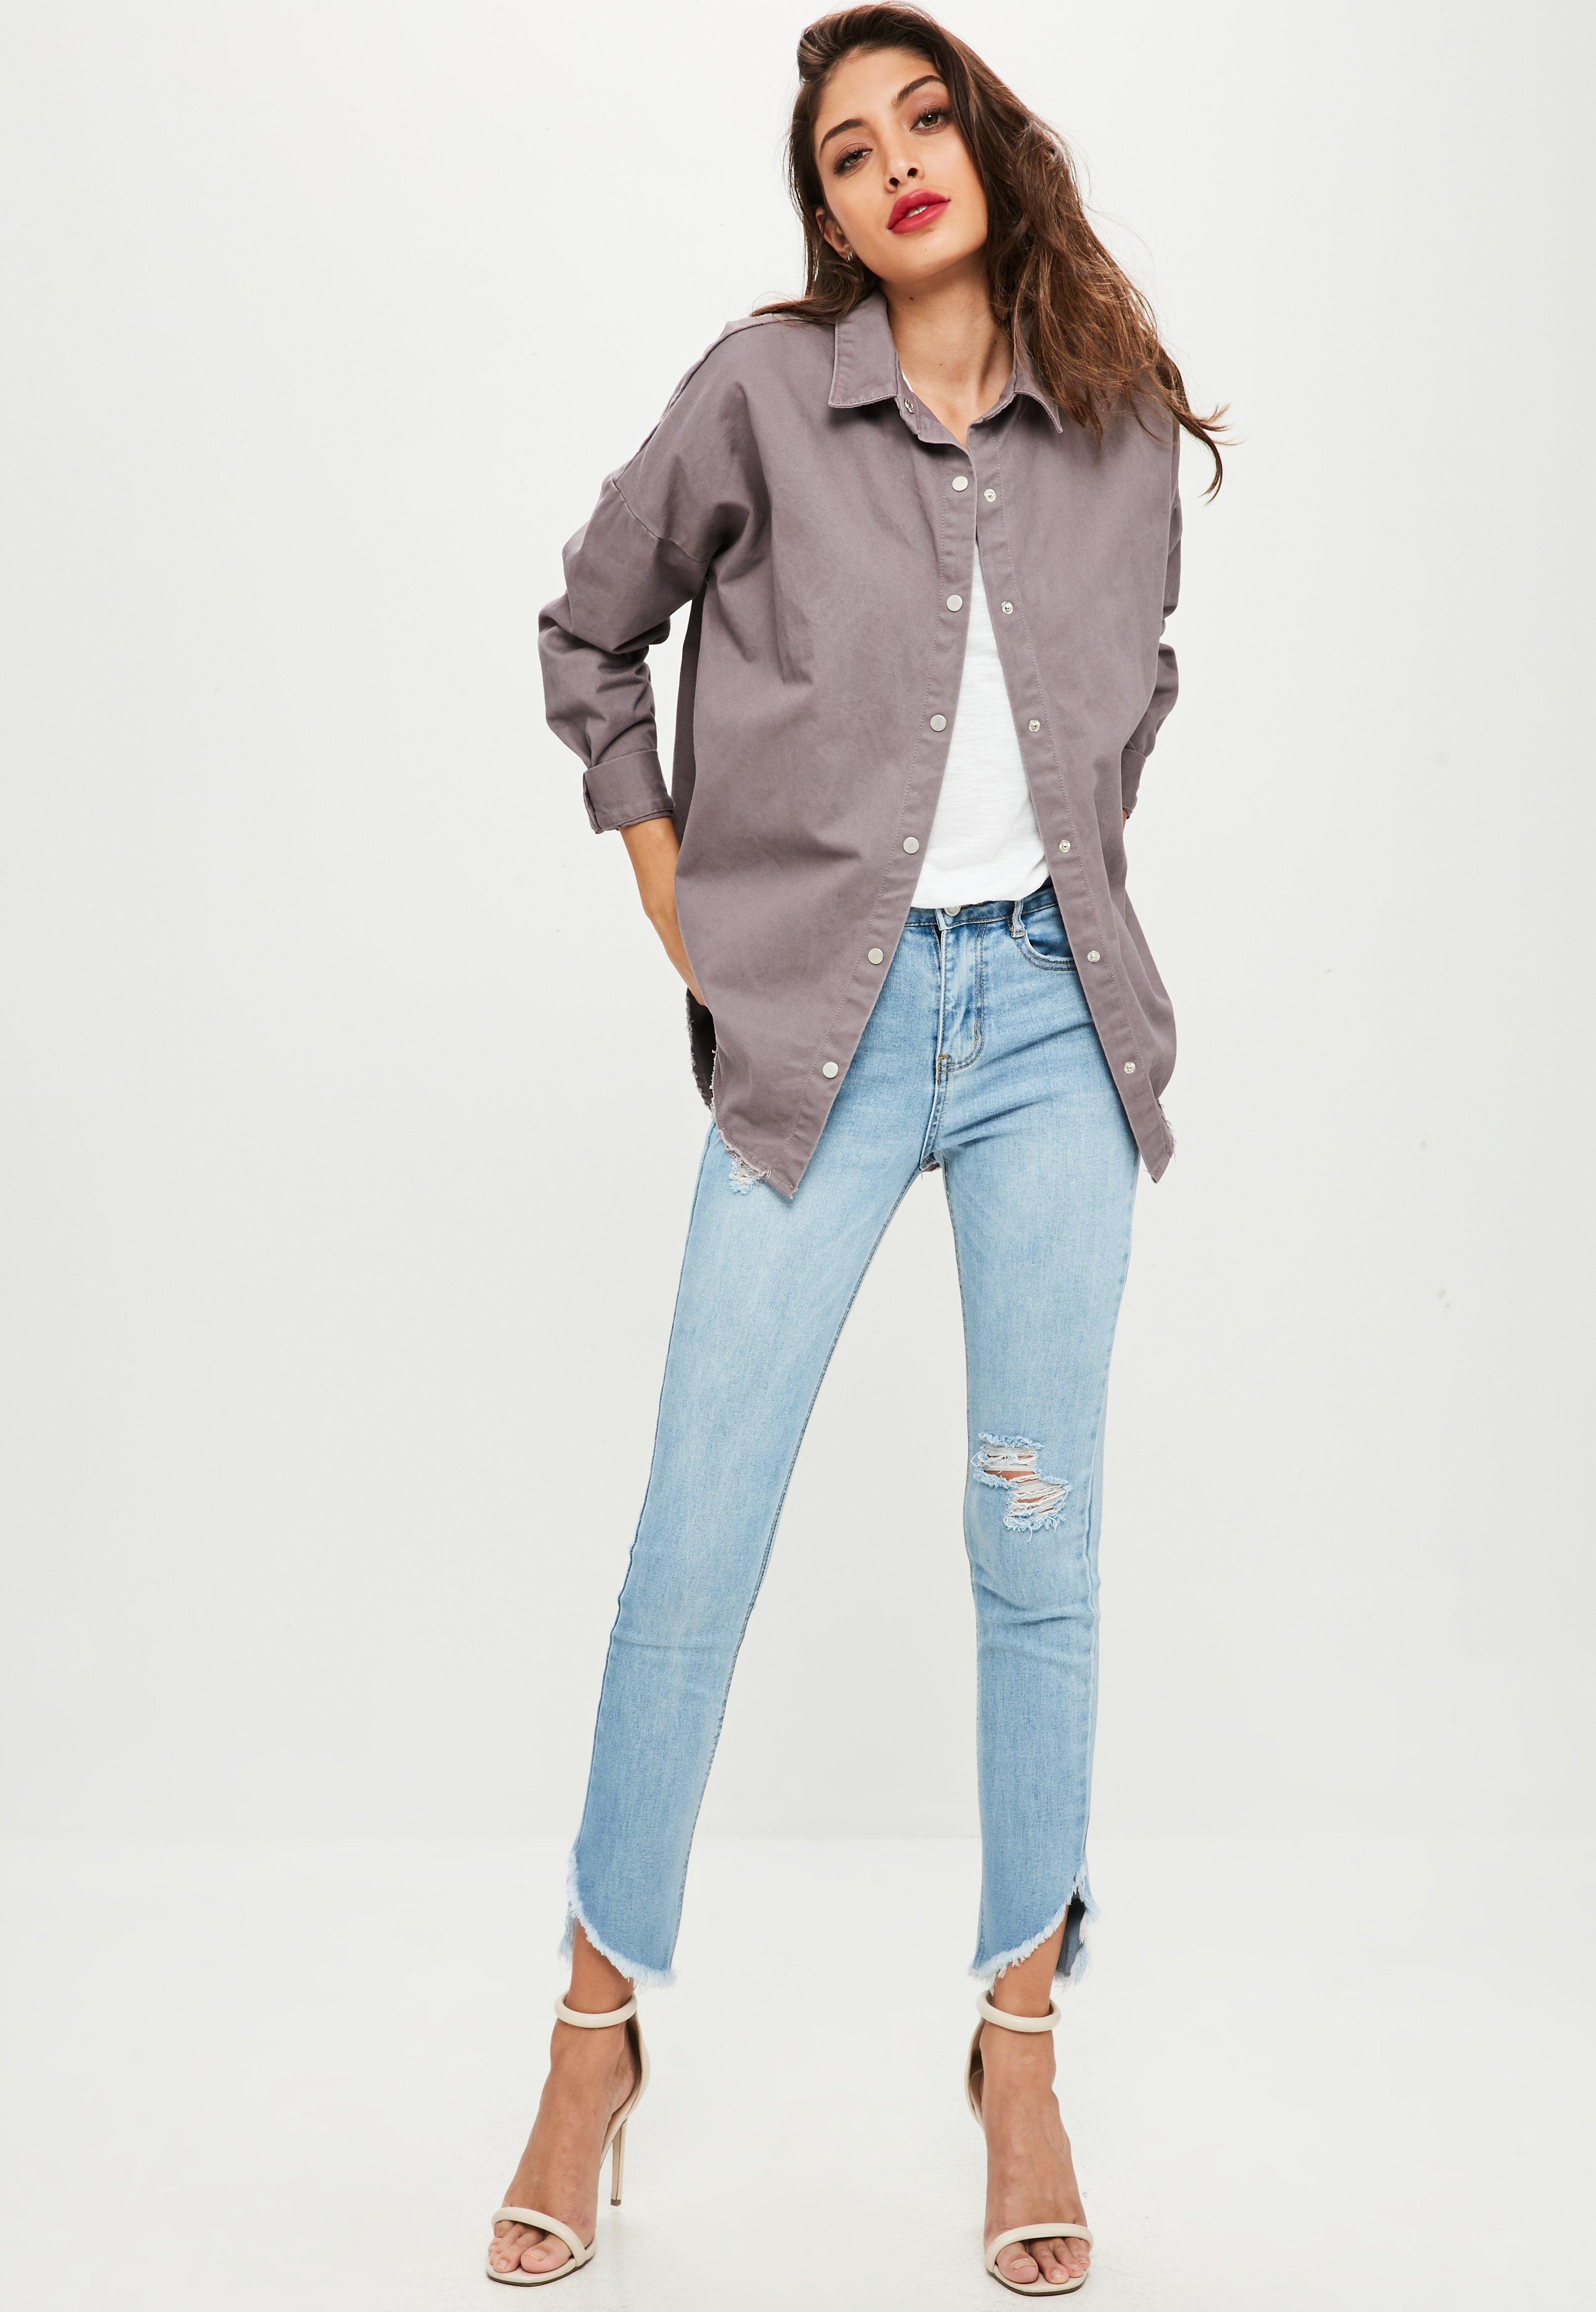 Lyst - Missguided Blue Sinner High Waisted Split Hem Skinny Jeans in ... 6c23fee7849f